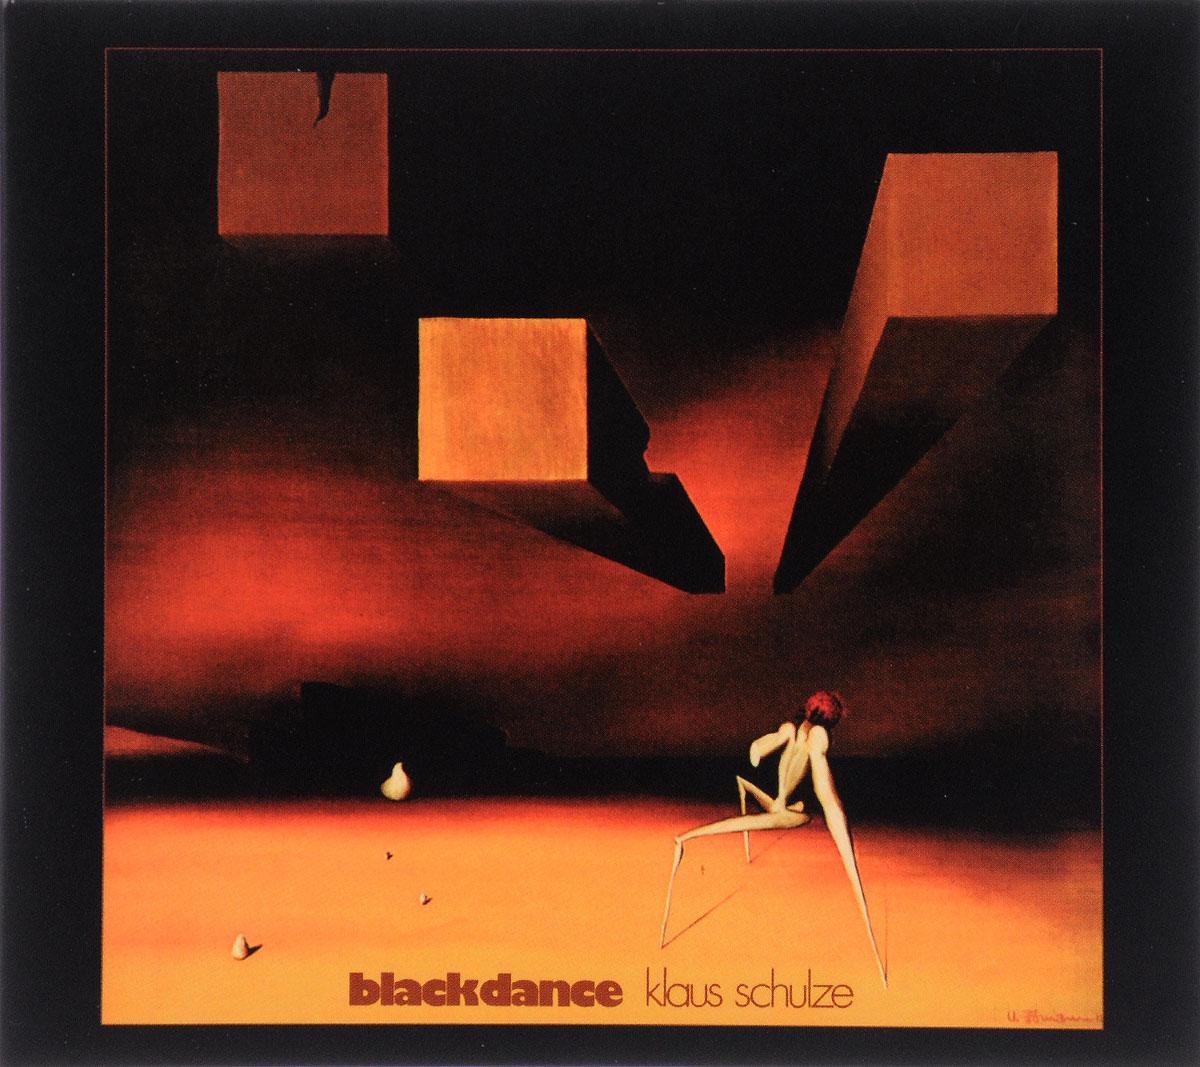 Klaus Schulze. Blackdance 2016 Audio CD